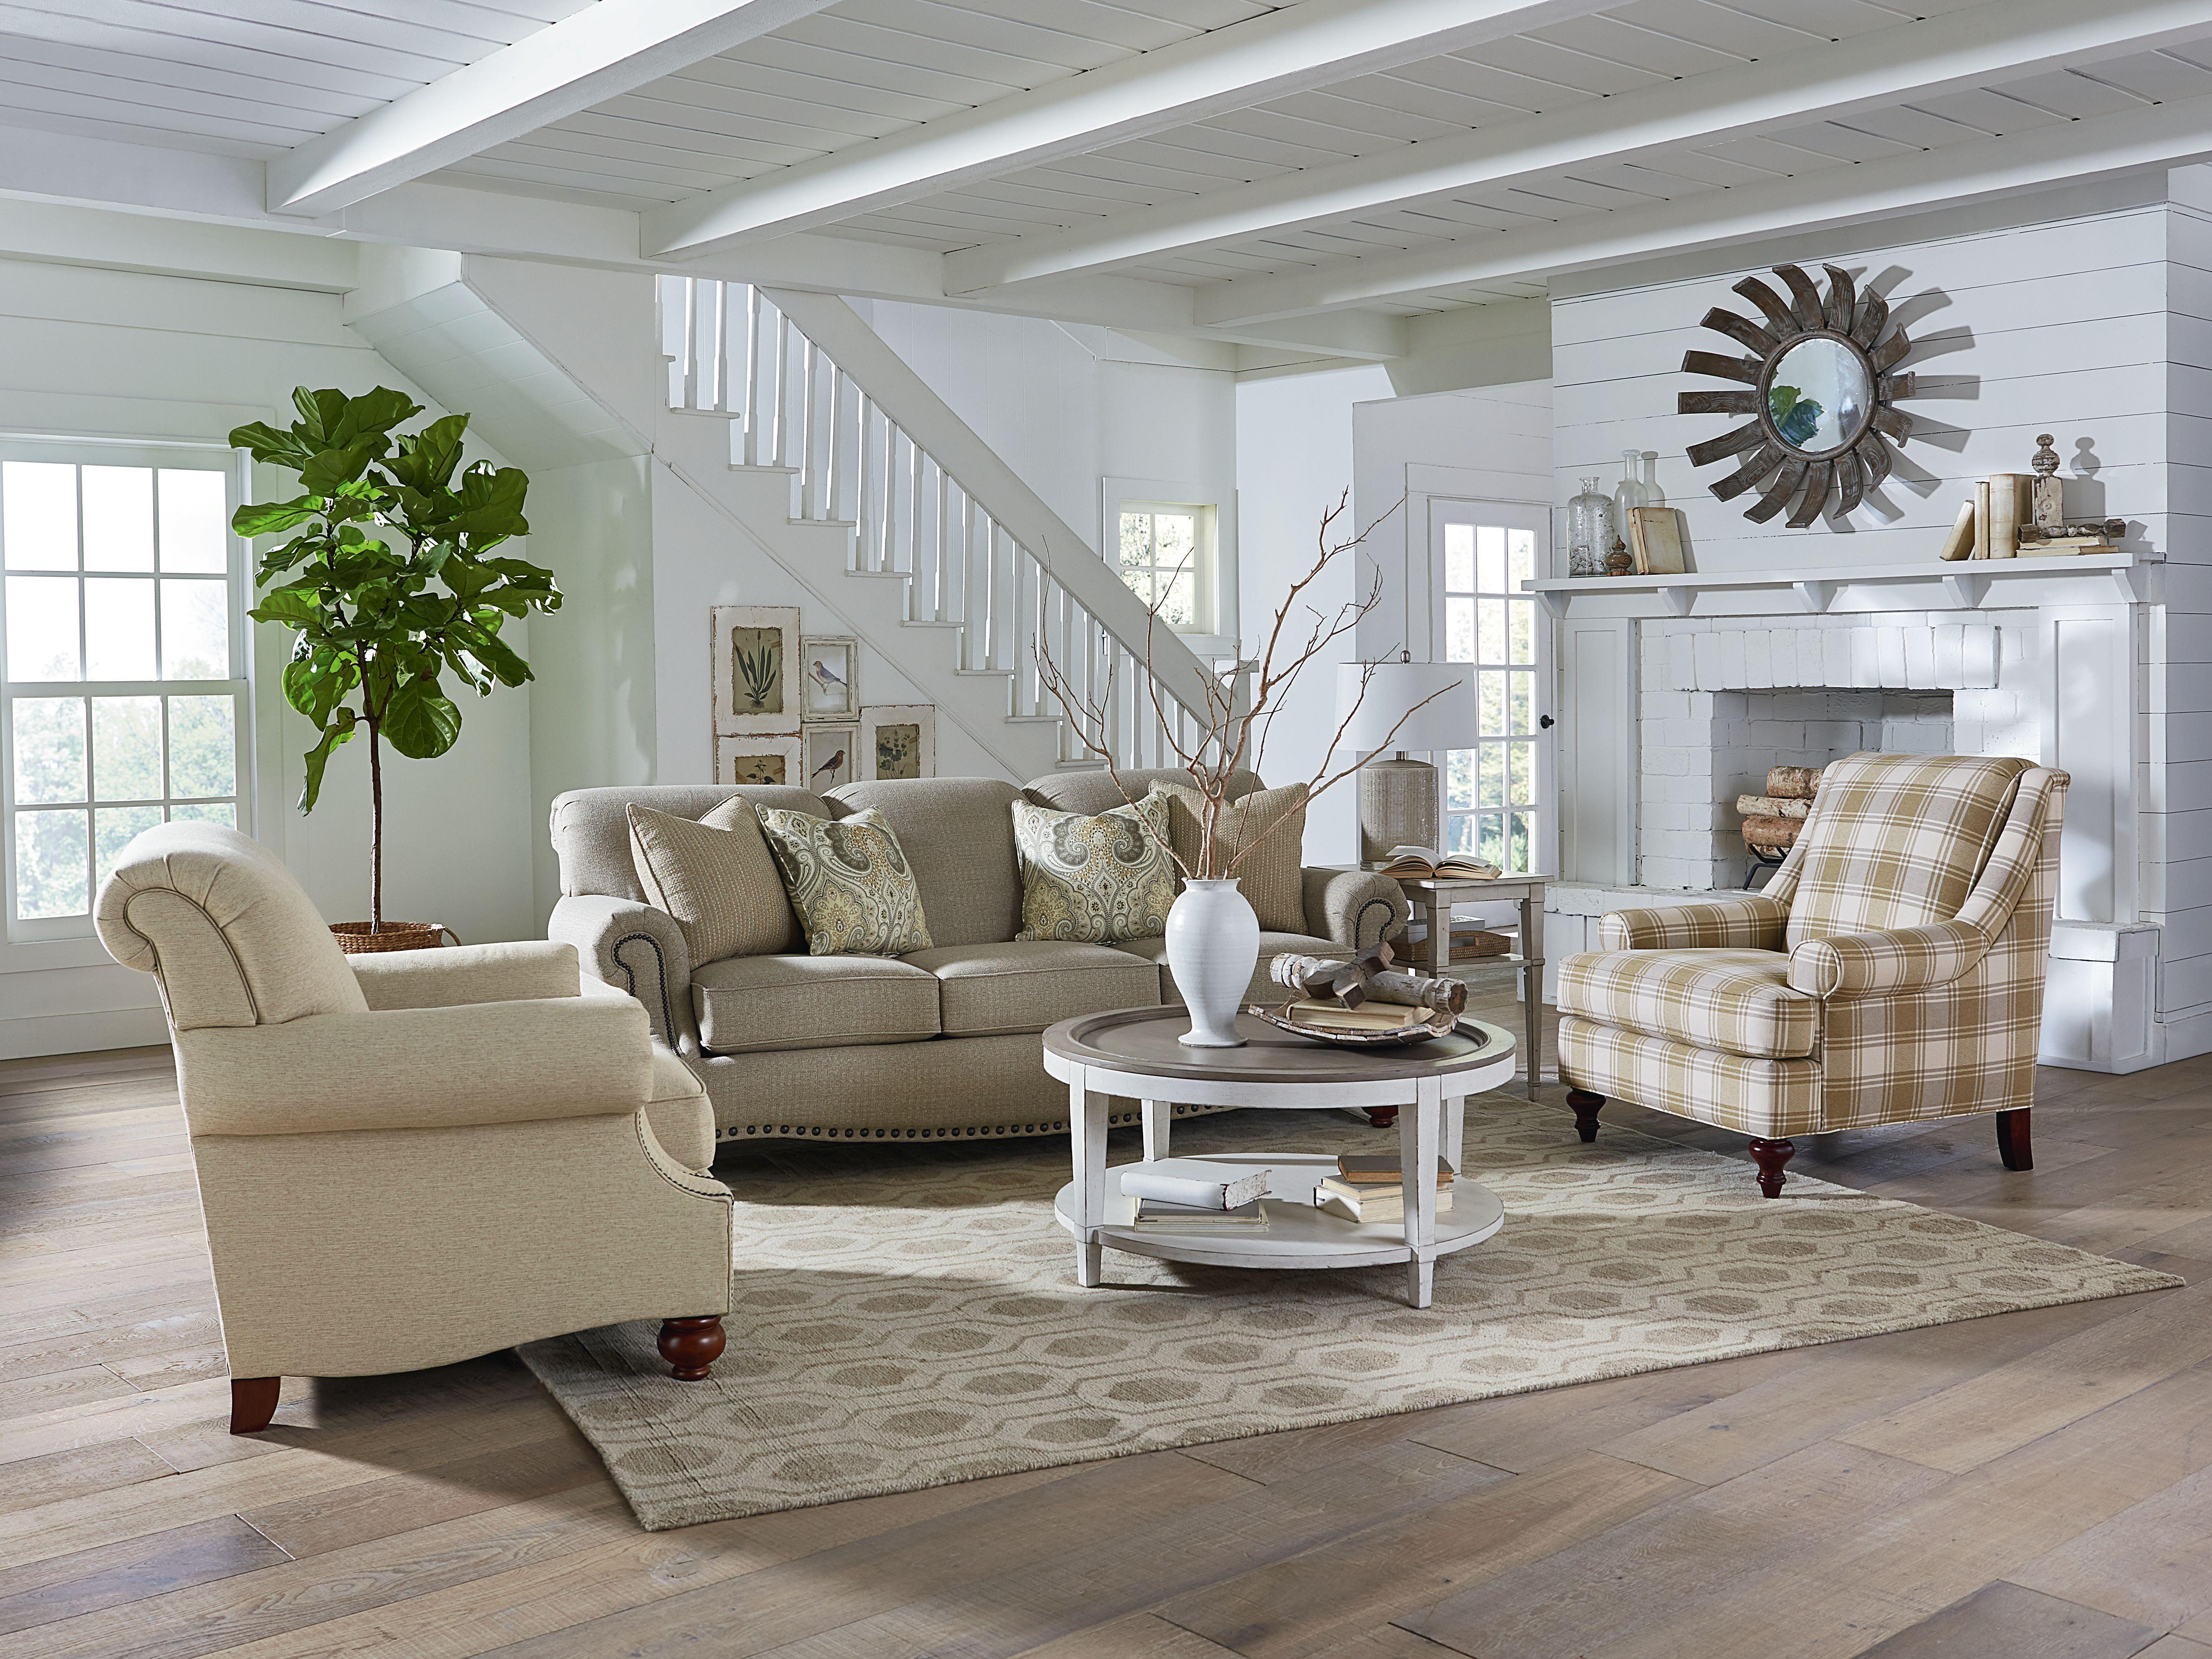 Bassett Furniture Specials – All American Mattress & Furniture